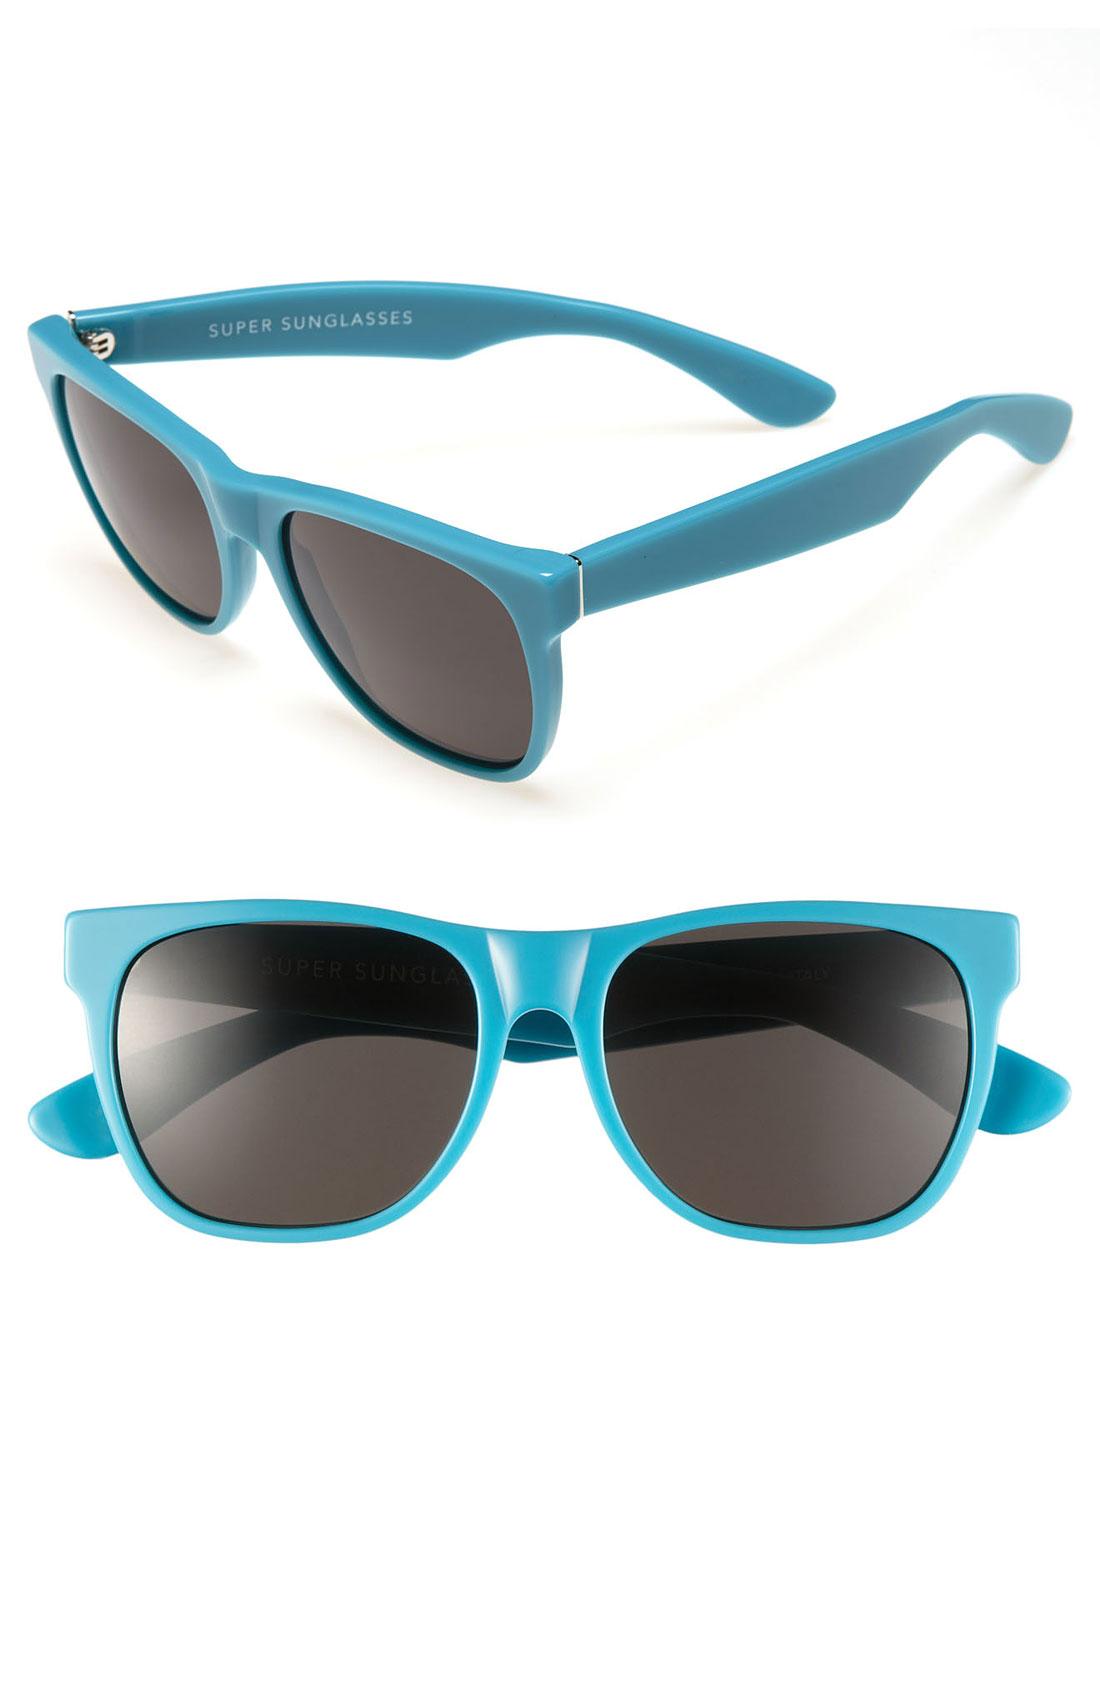 096249c9781 clearance designer sunglasses